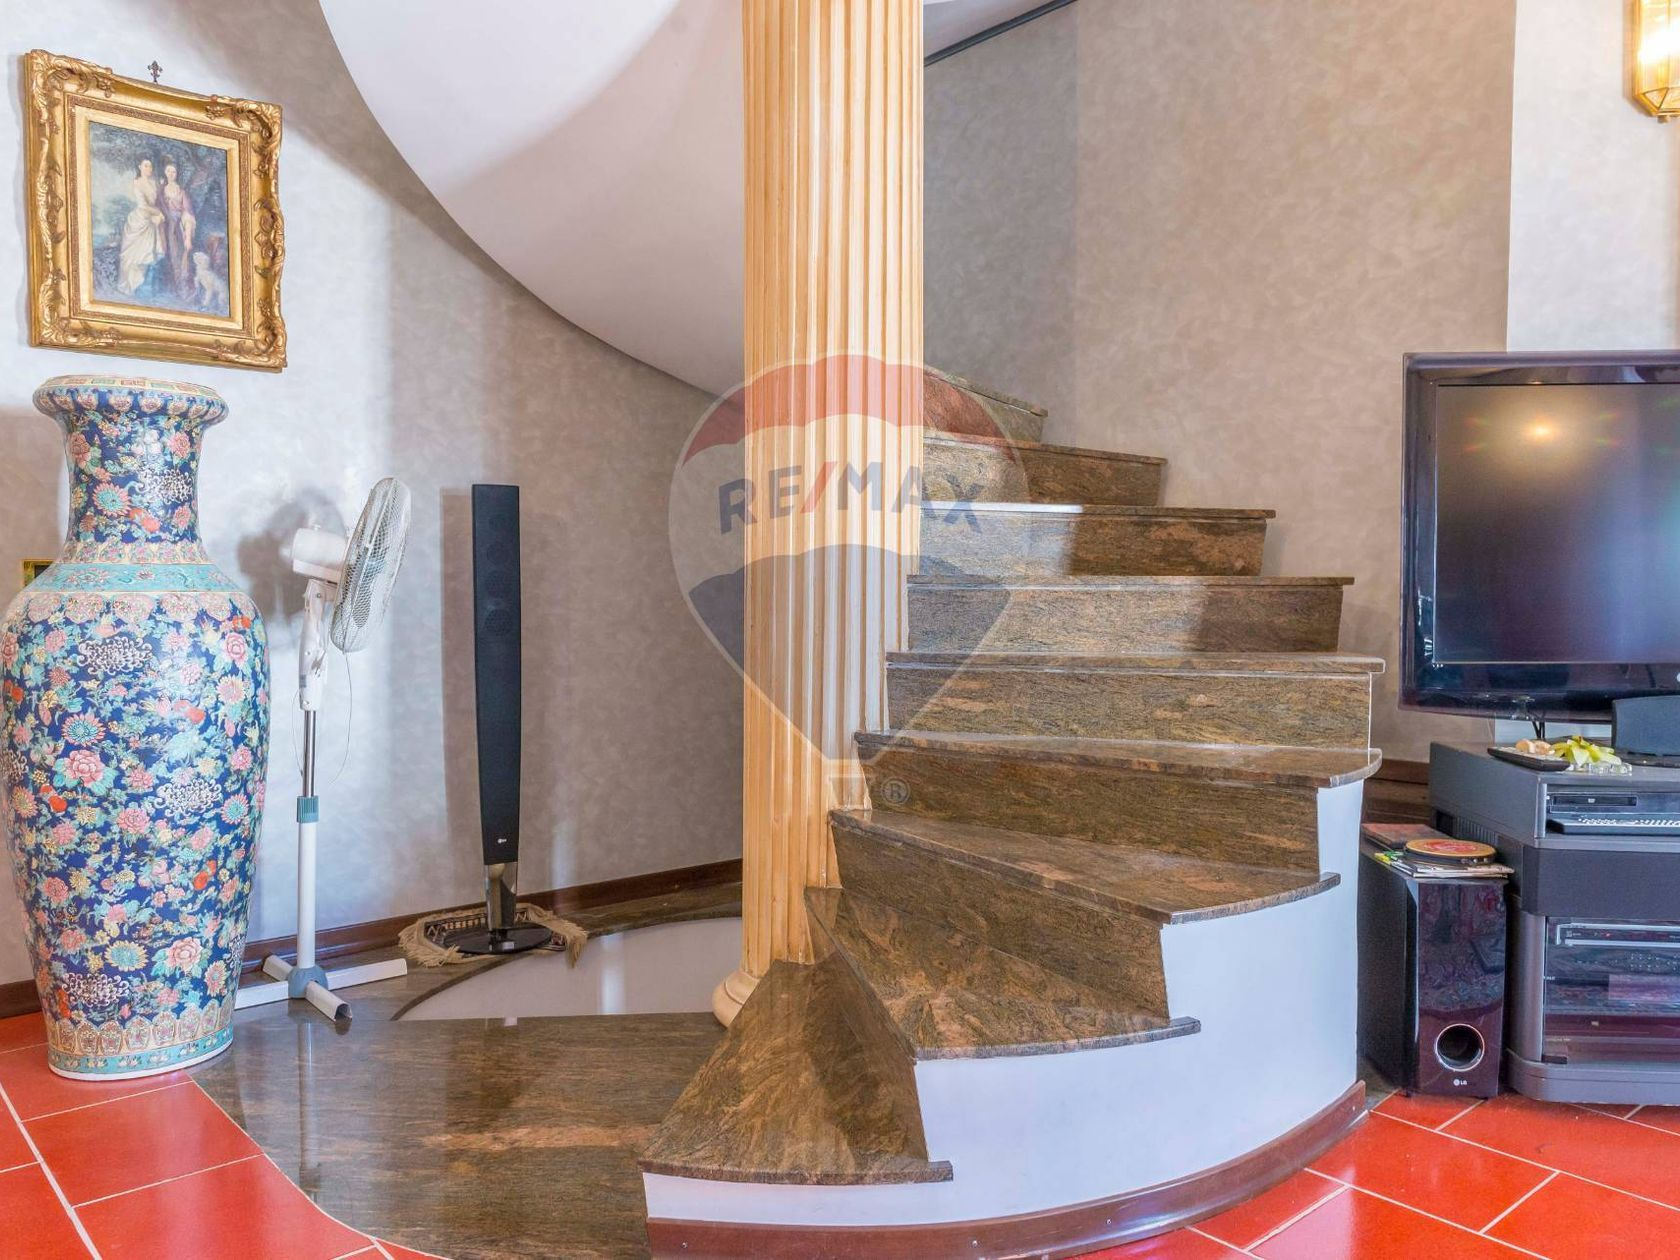 Villa singola Roma - Castelverde - Villaggio Prenestino, Roma, RM Vendita - Foto 21